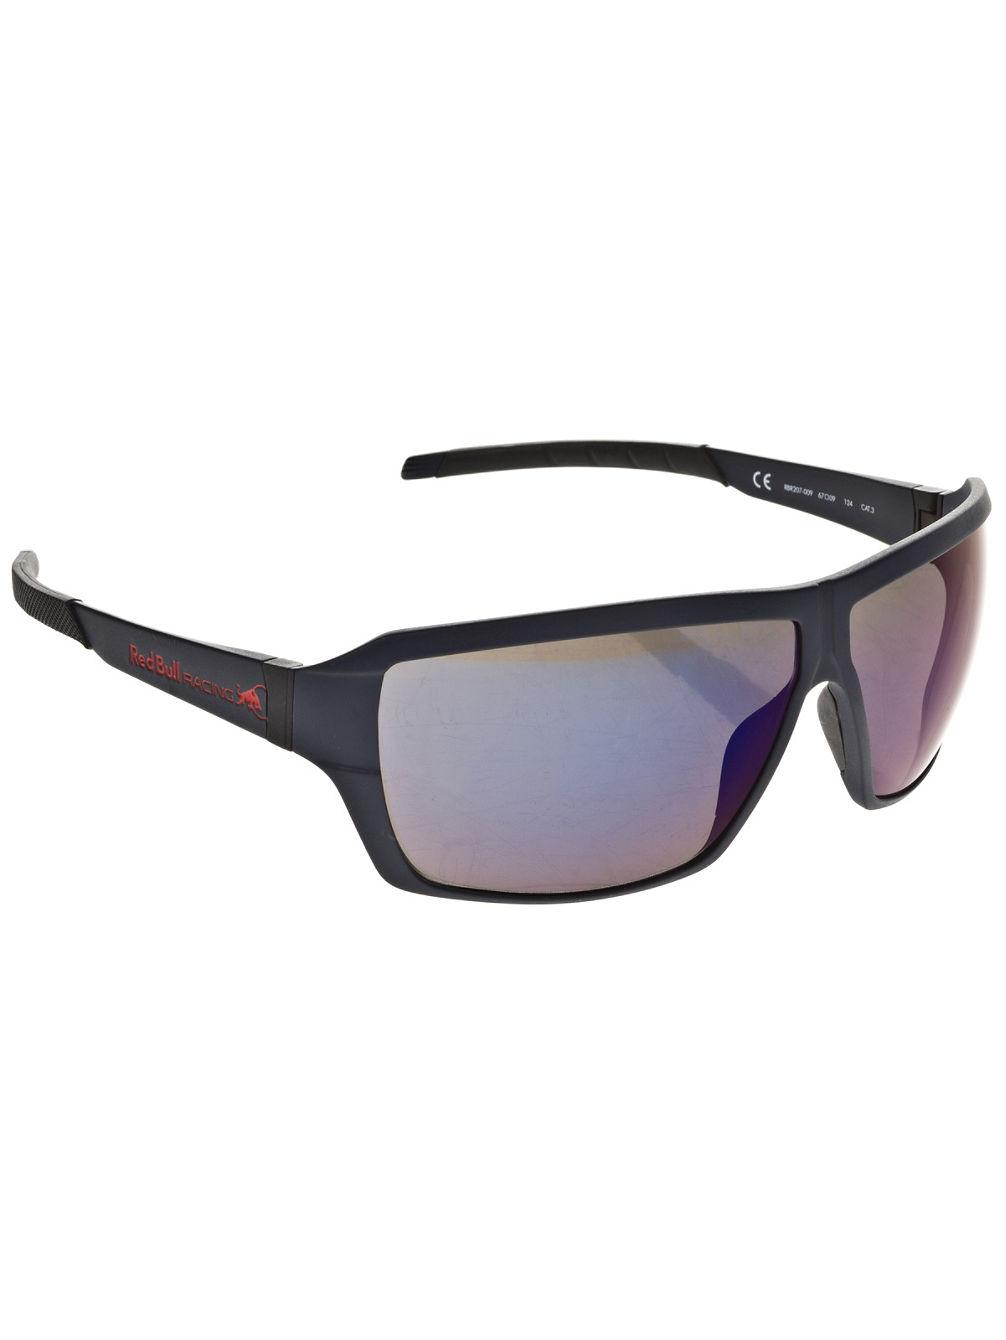 red-bull-racing-eyewear-rbr207-matte-black